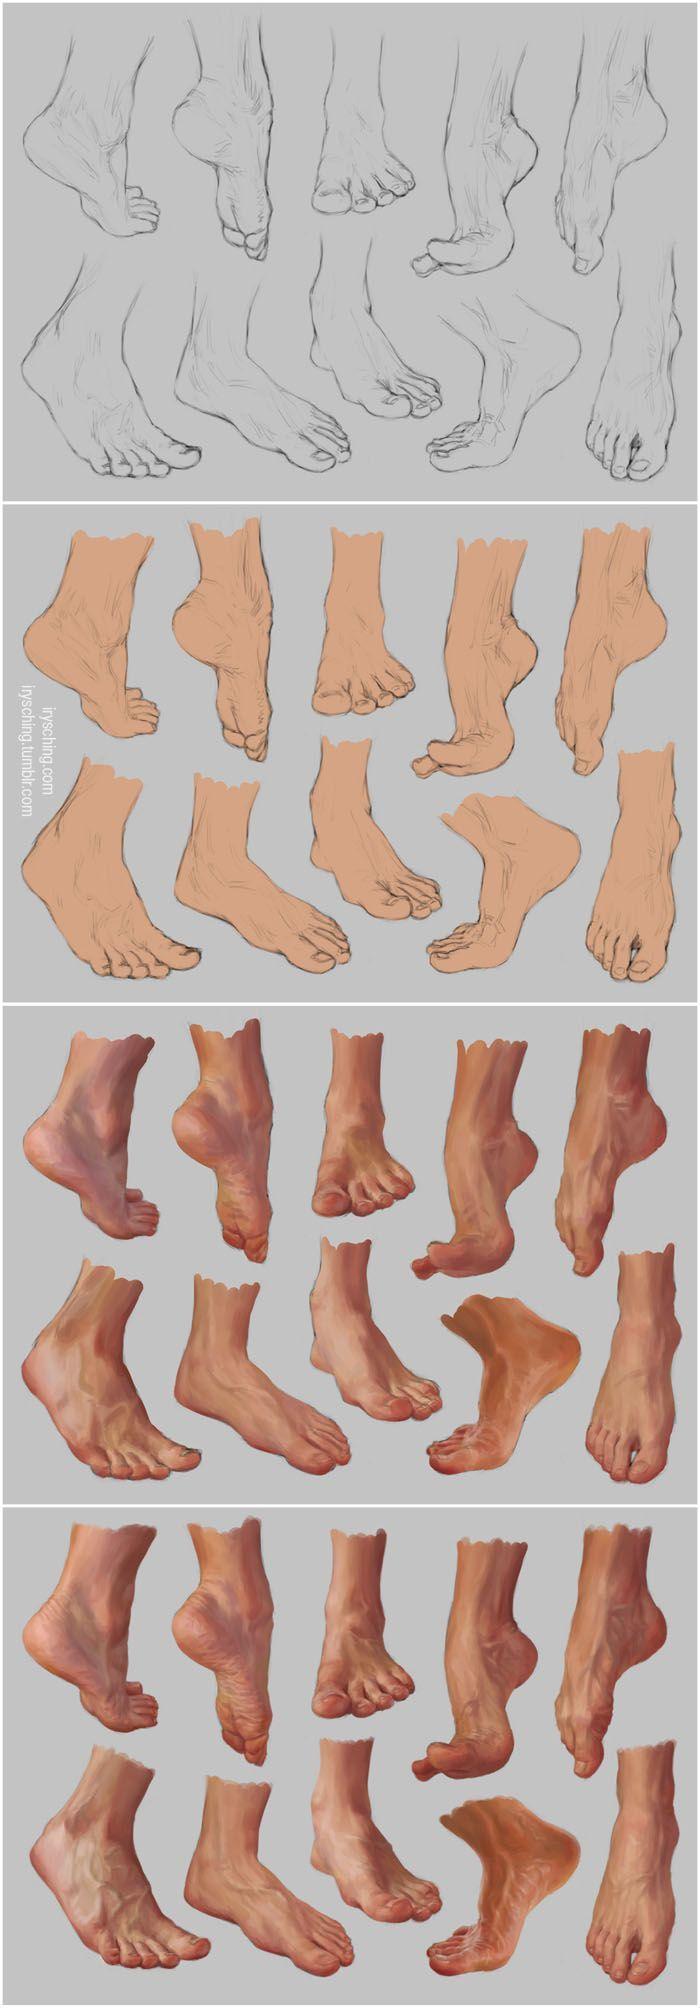 studio piedi